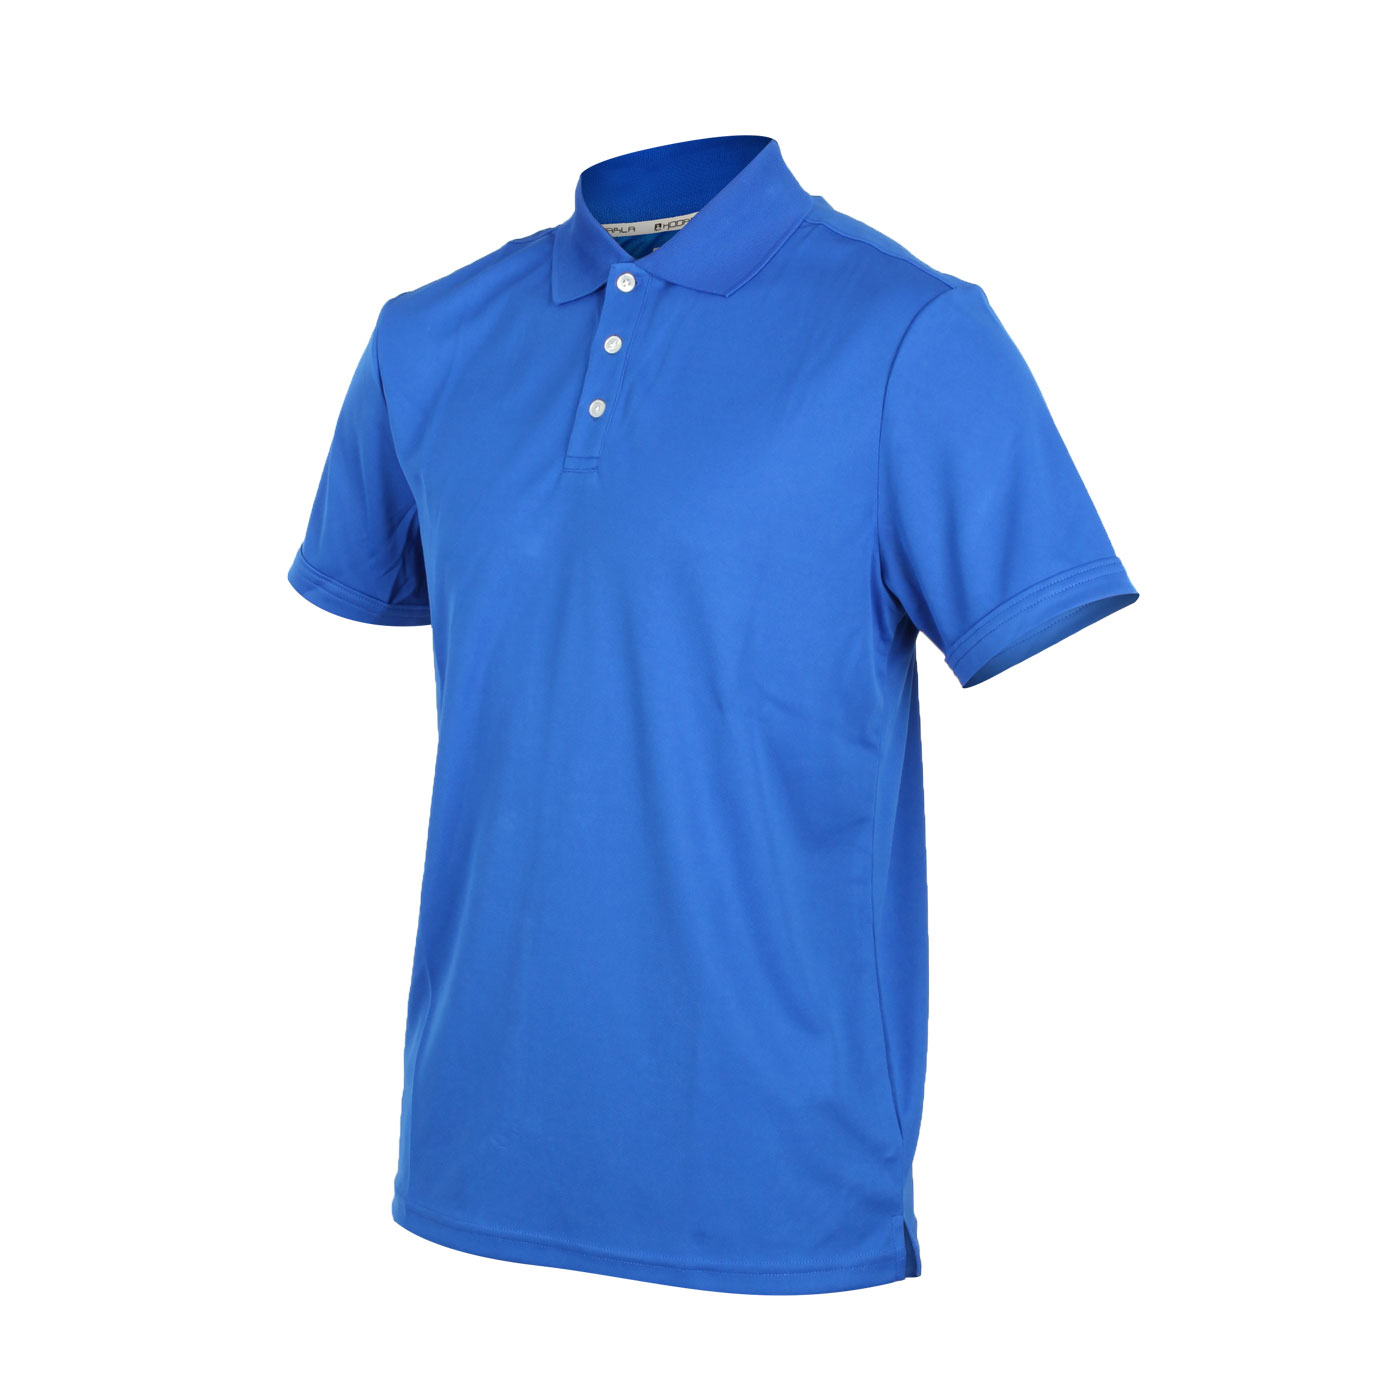 HODARLA 星際吸濕排汗短袖POLO衫 3151501 - 藍